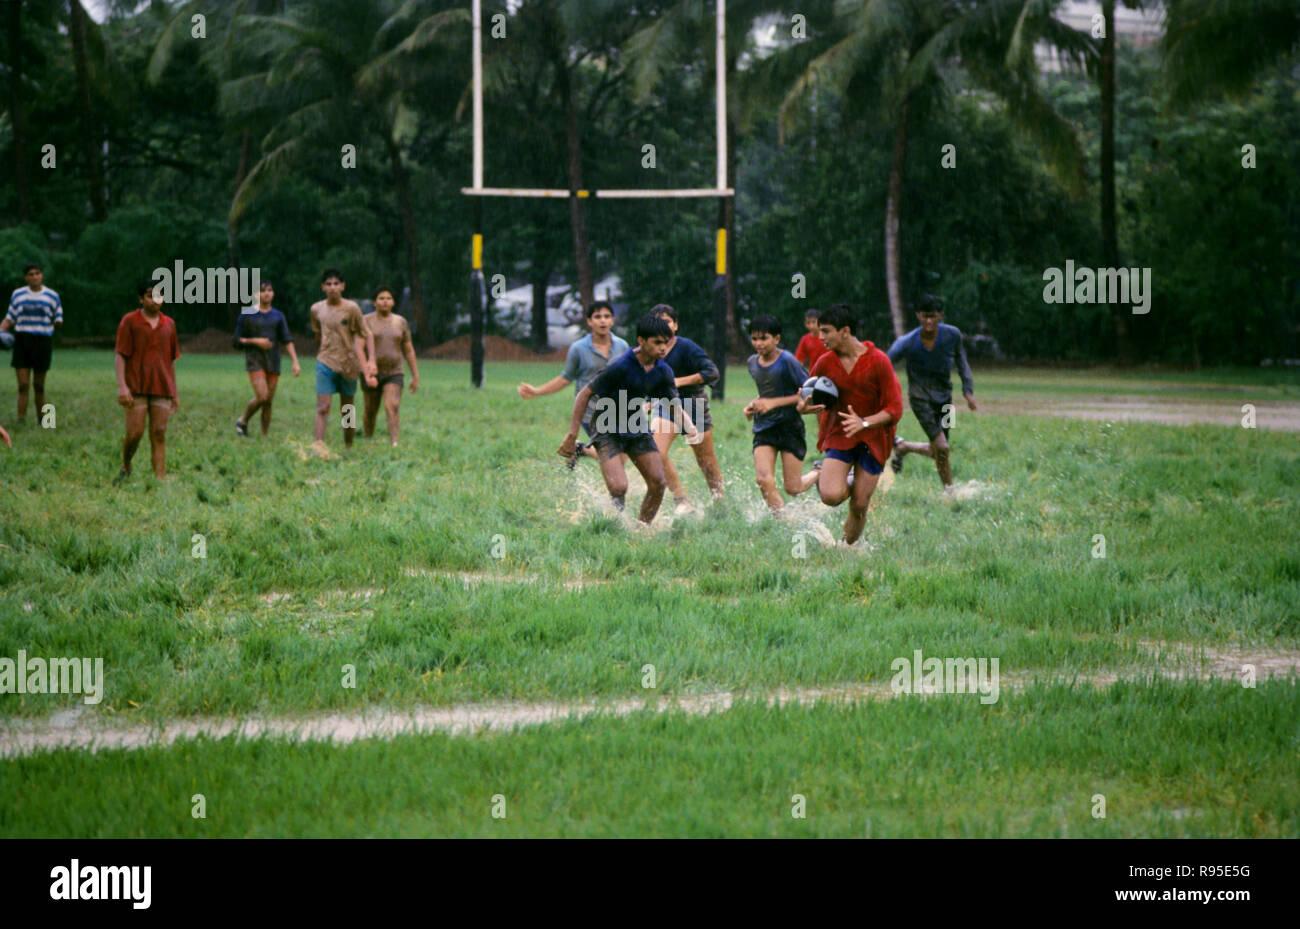 Ragazzi giocare il football americano in monsone, Bombay Bombay, Maharashtra, India Immagini Stock